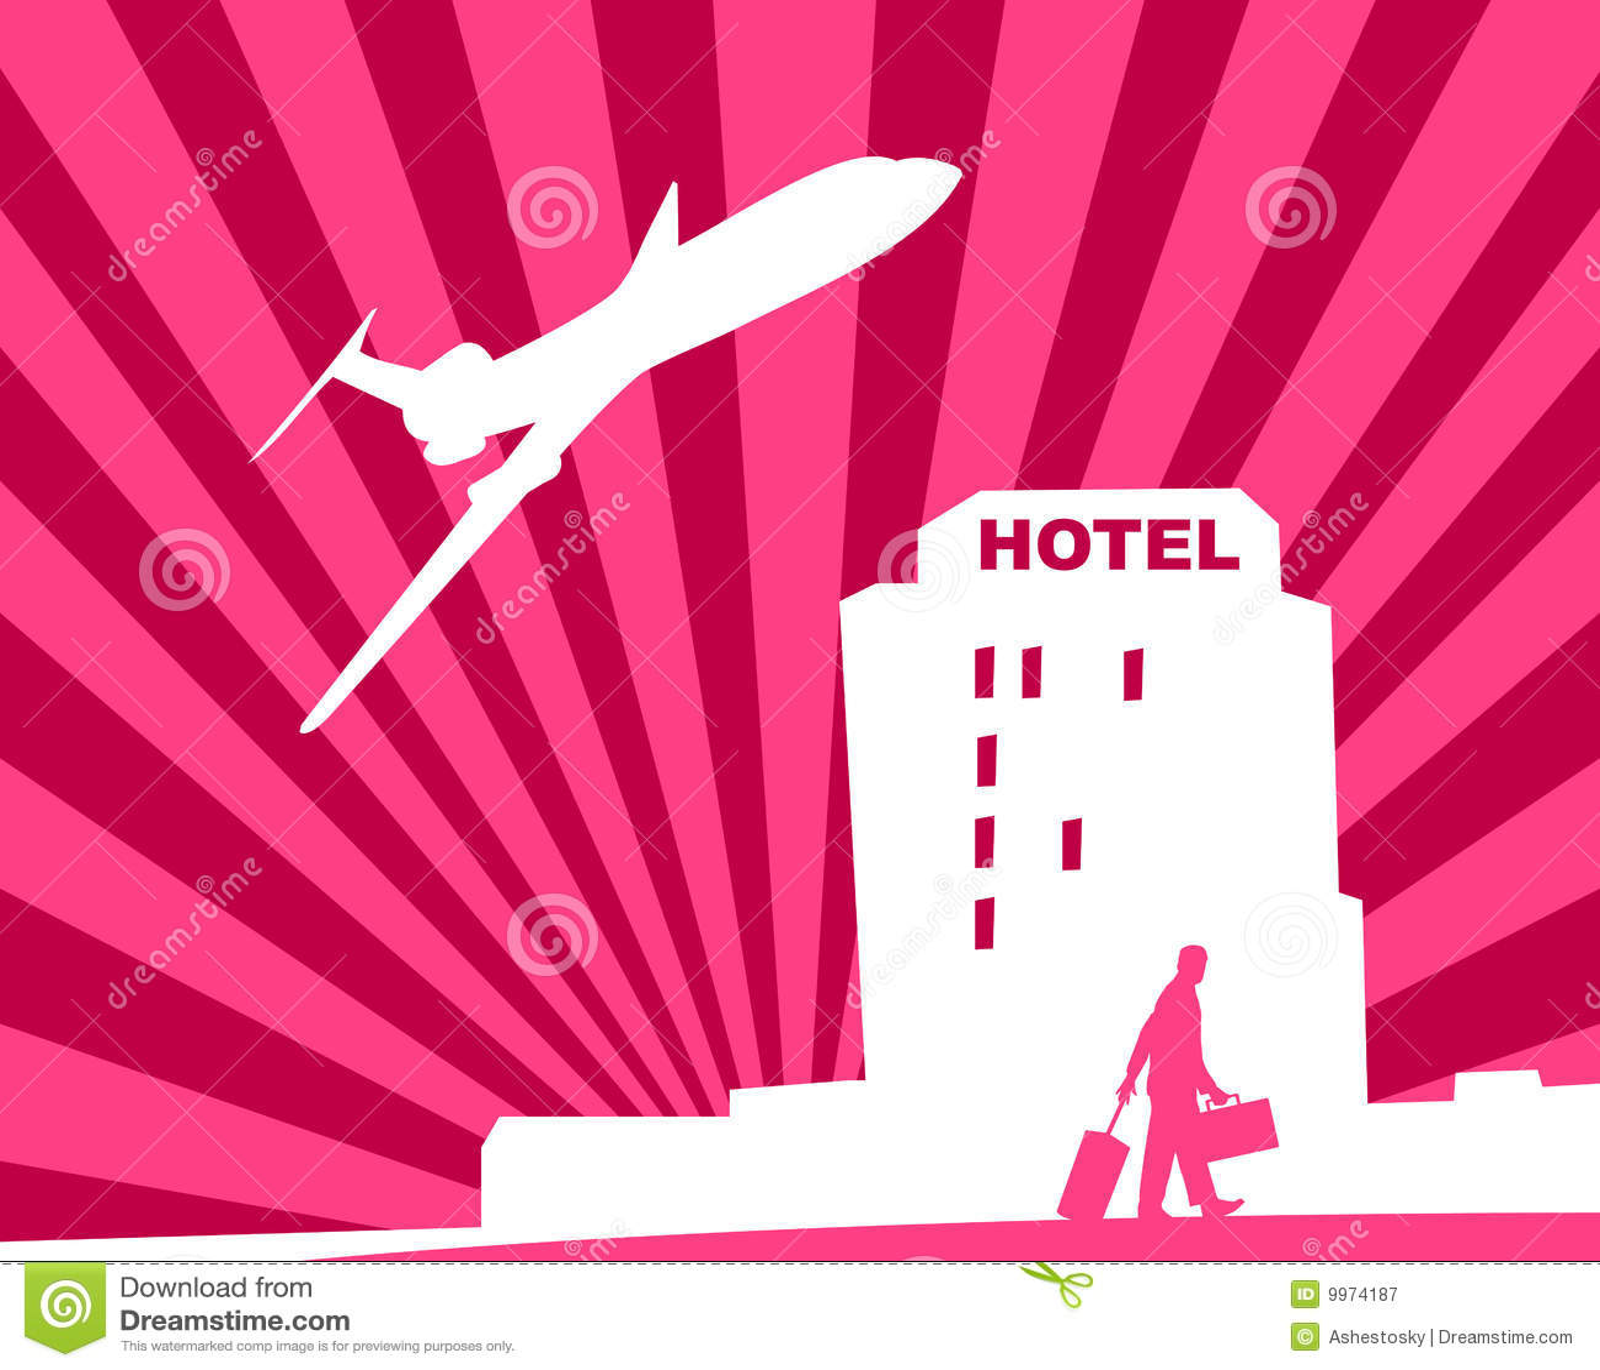 travel design background royalty free stock photography - image